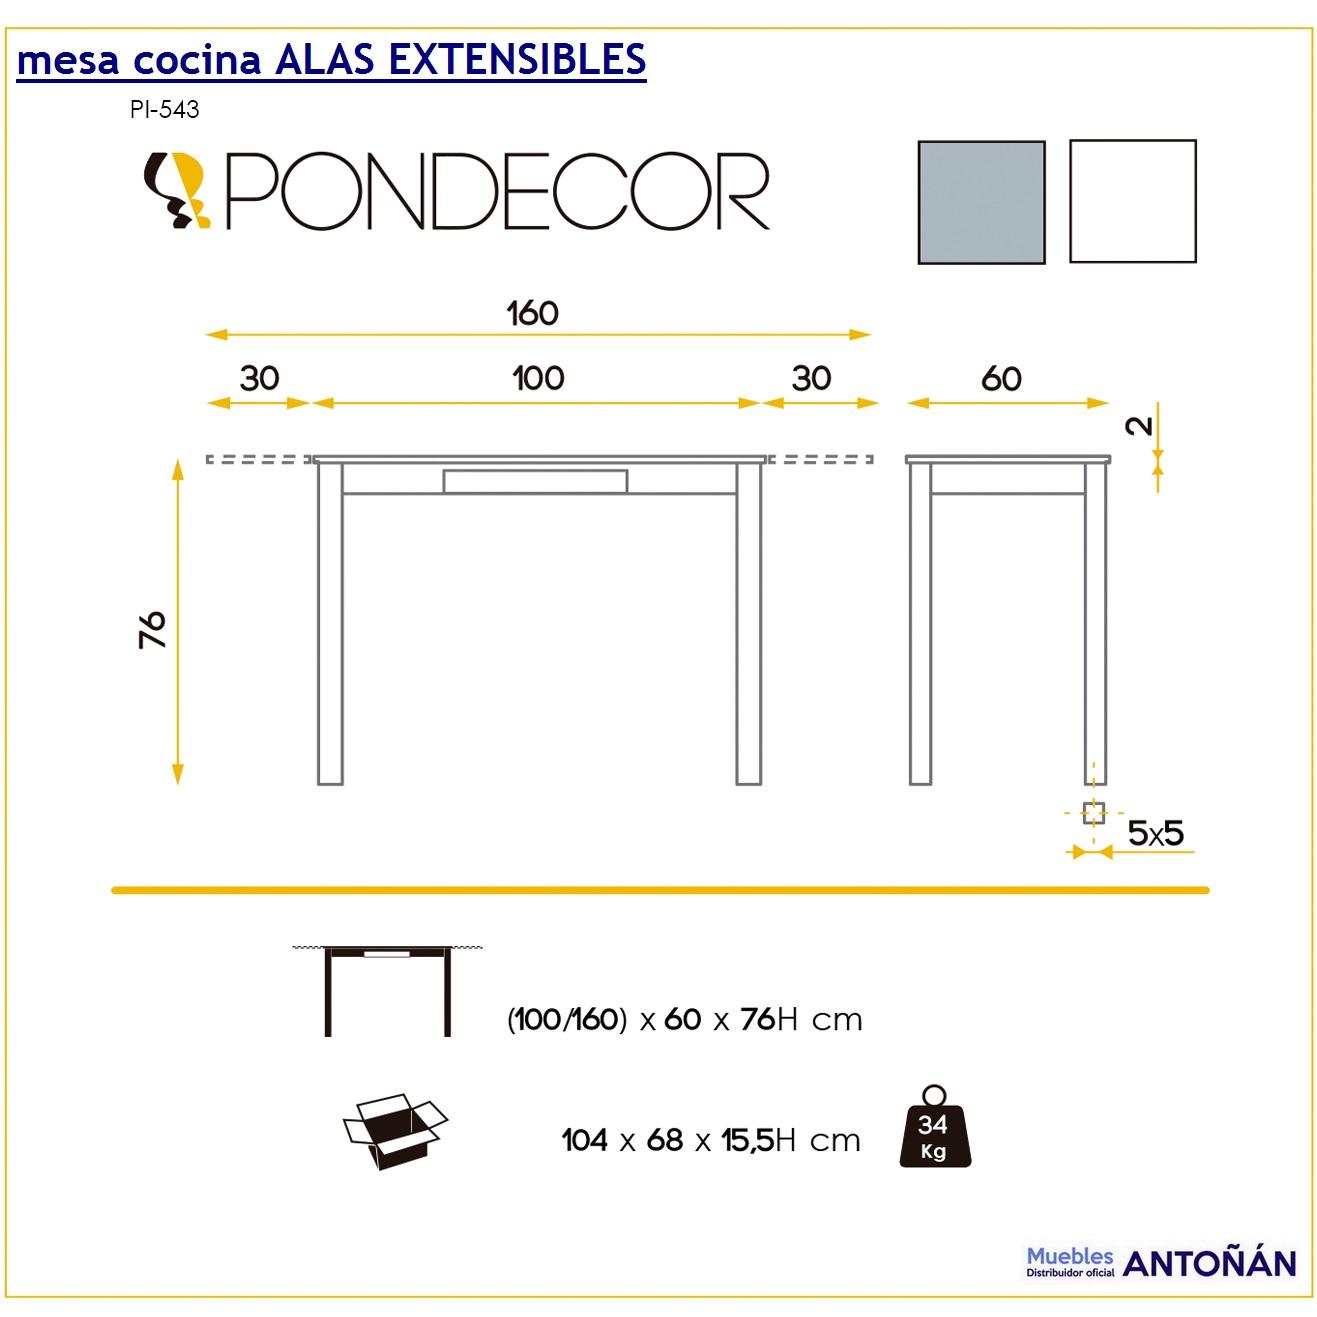 Mesas cocina ALAS EXTENSIBLES by CMC Unique Pondecor en ...